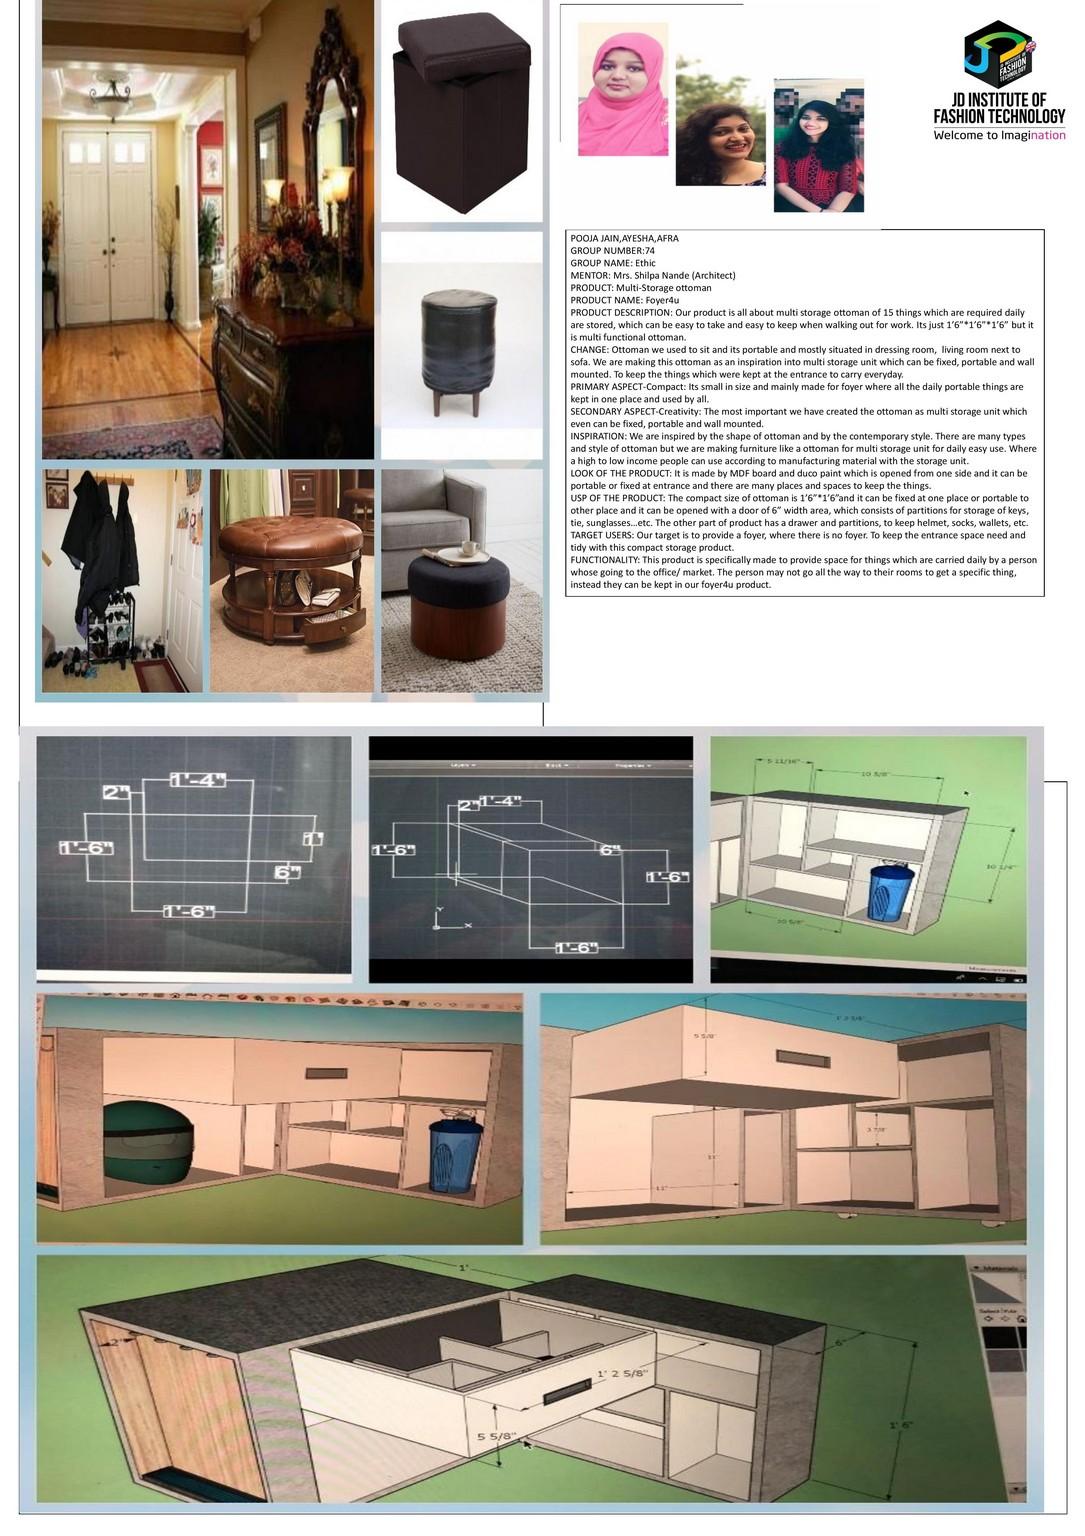 Foyer4u – CHANGE – JD Annual Design Awards 2018   Designer: pooja jain, Ayesha Ahmedulla Khan, Afra Tabassum Touheed   Photography : Jerin Nath (@jerin_nath) foyer4u Foyer4u – CHANGE – JD Annual Design Awards 2018 foyer4u1